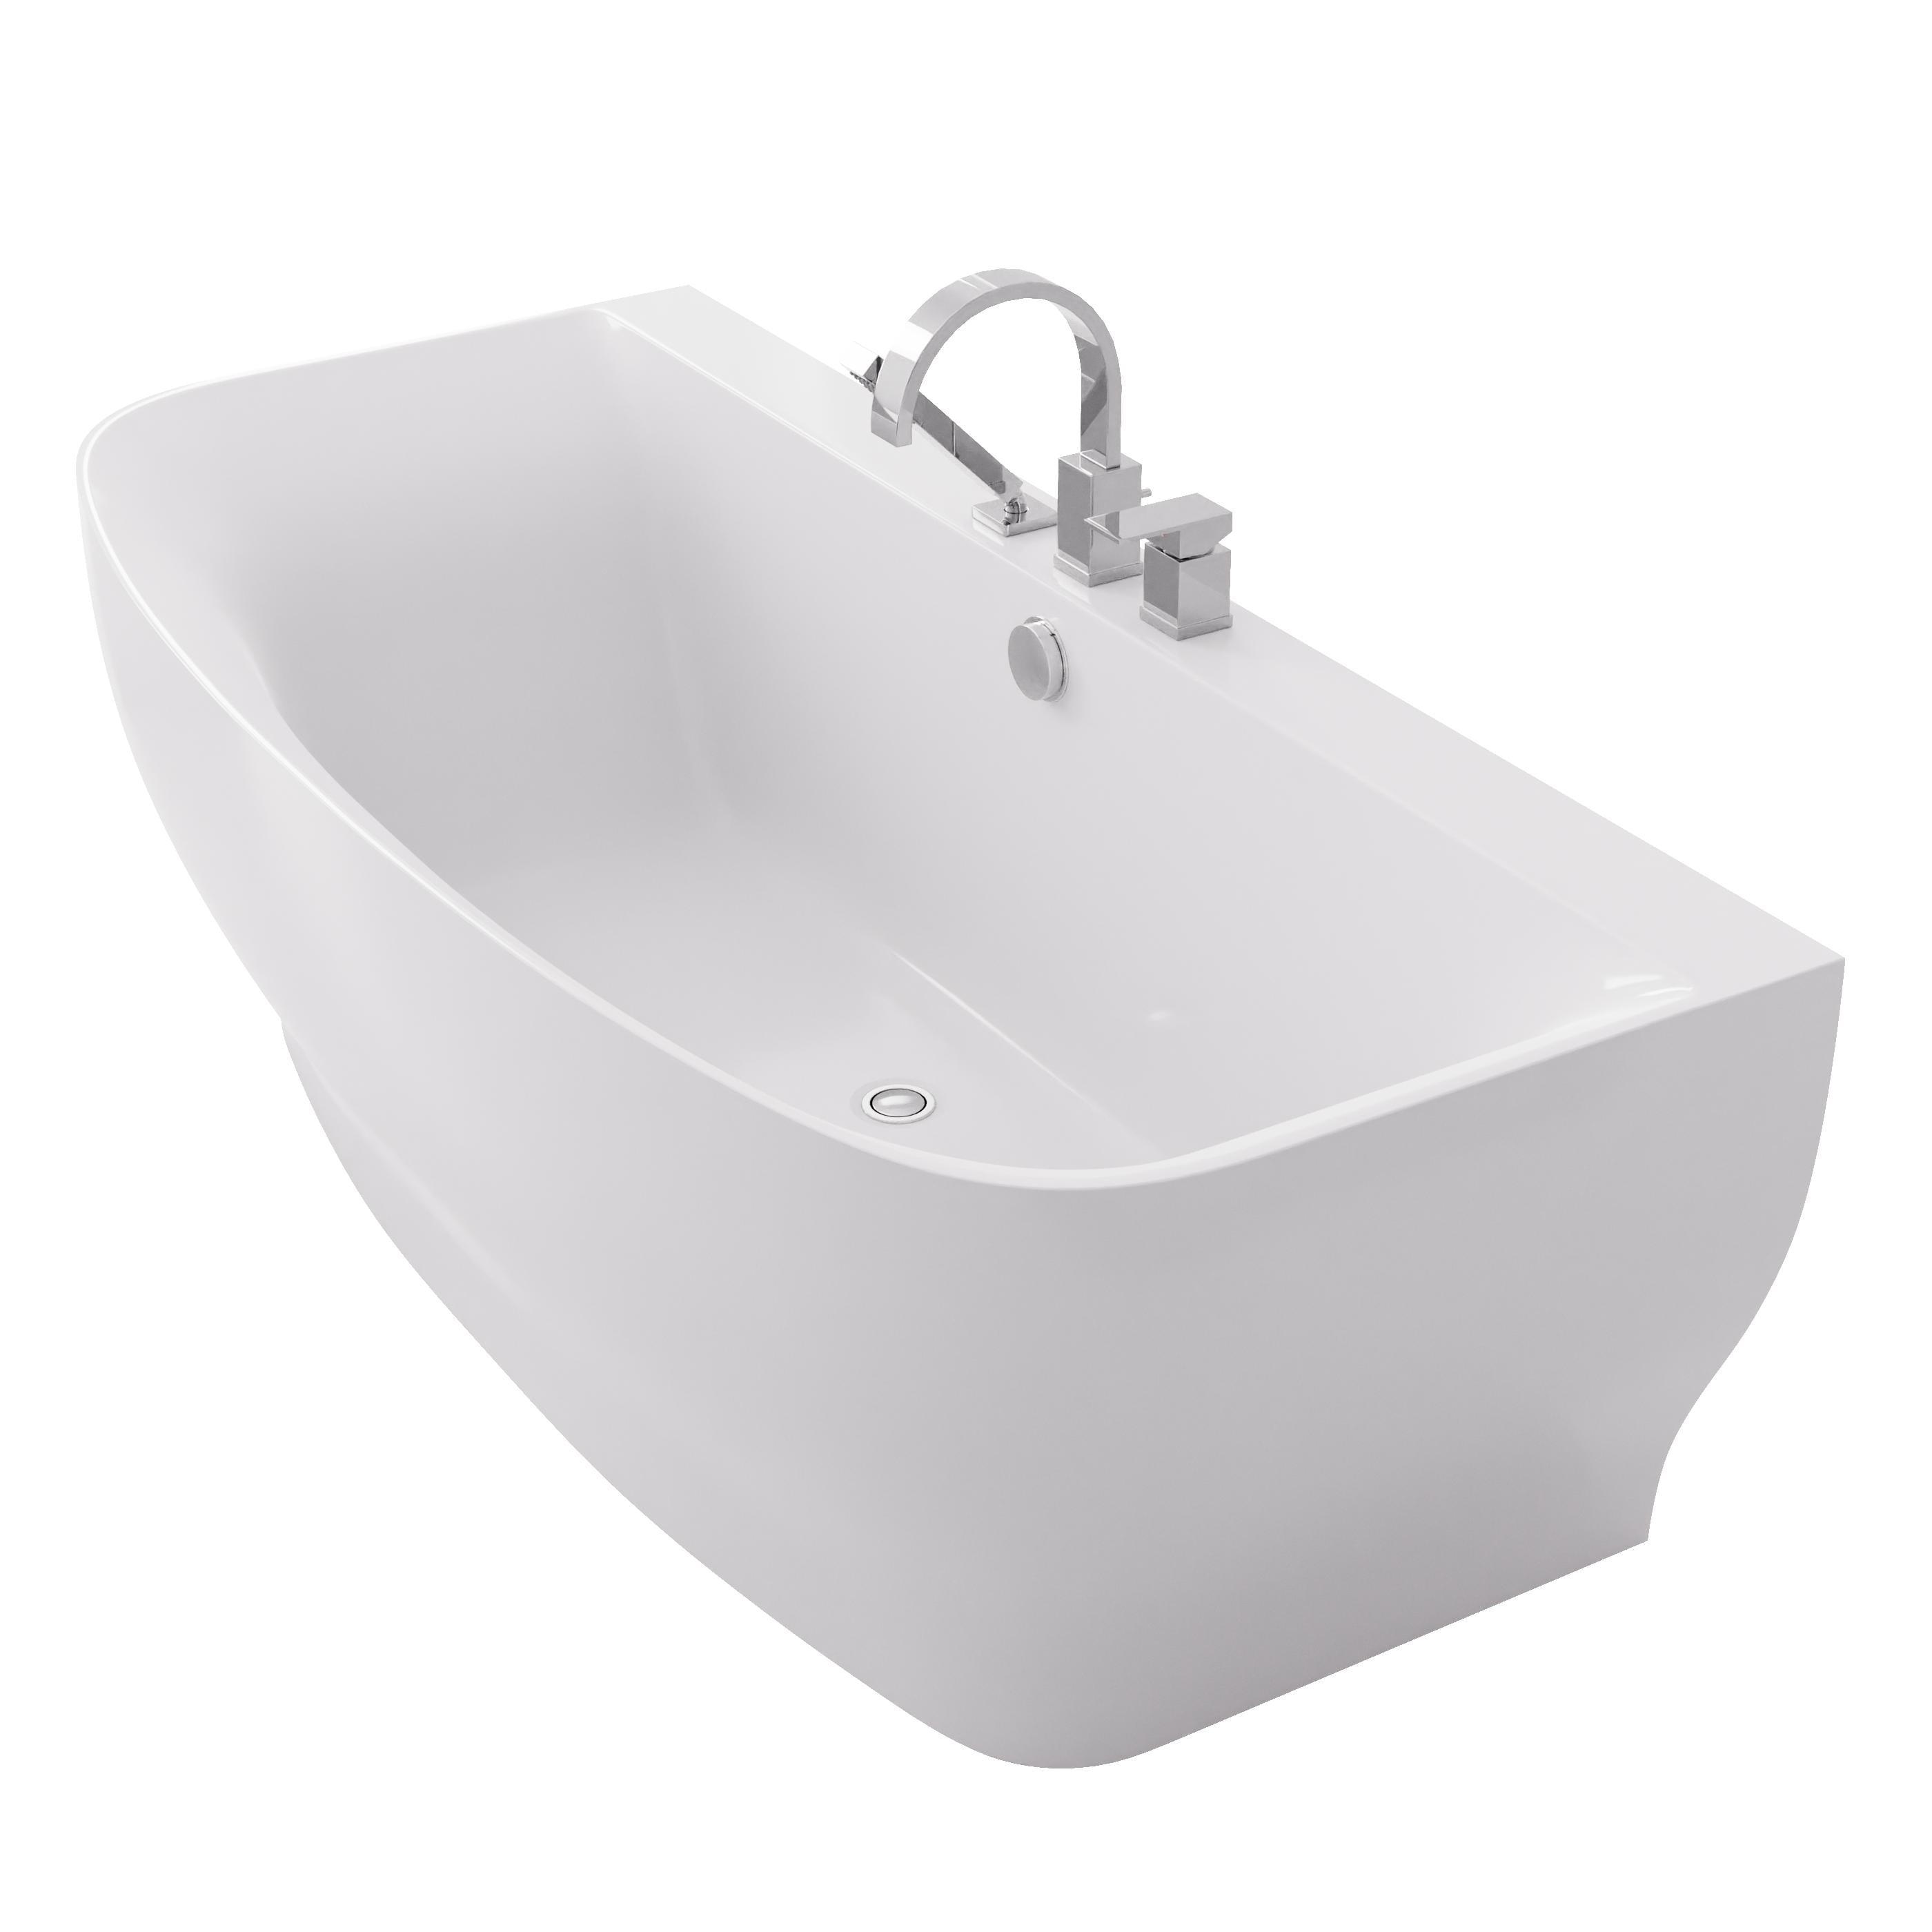 Shop ANZZI Bank Series White 65 in. Acrylic Freestanding Bathtub